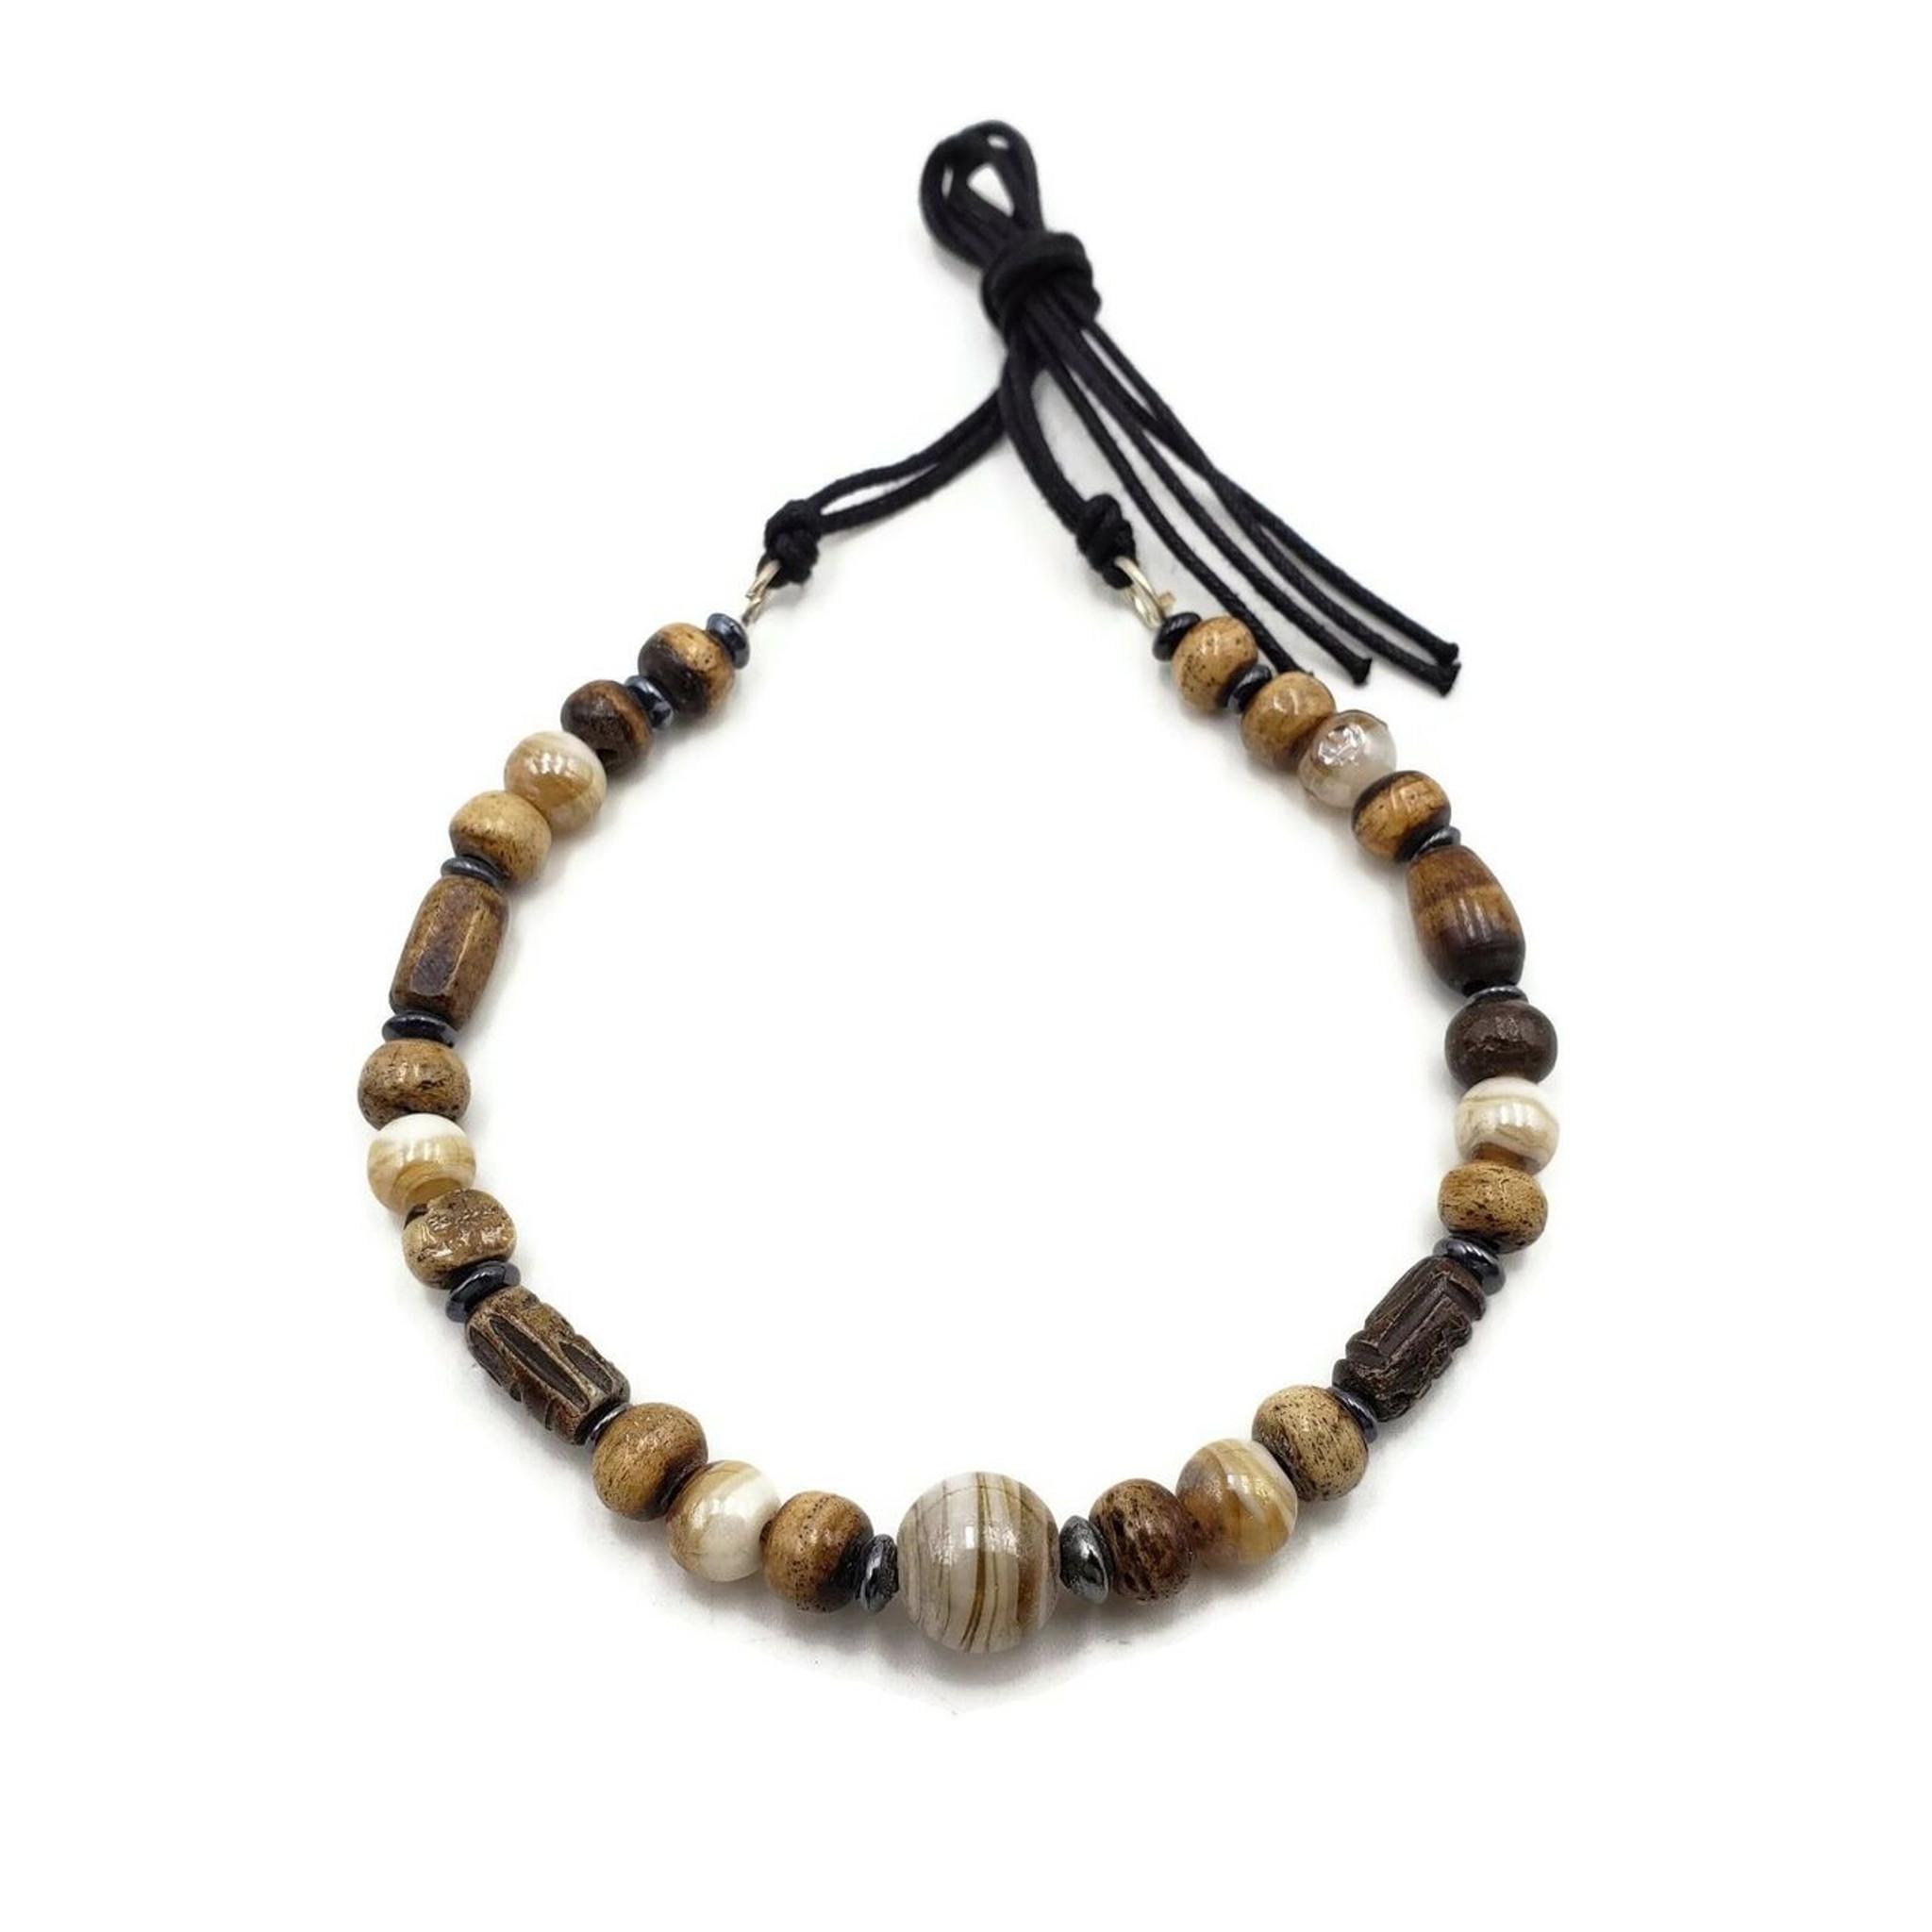 Sula Buffalo Bone Choker with Hair Pipe and Wood Beads